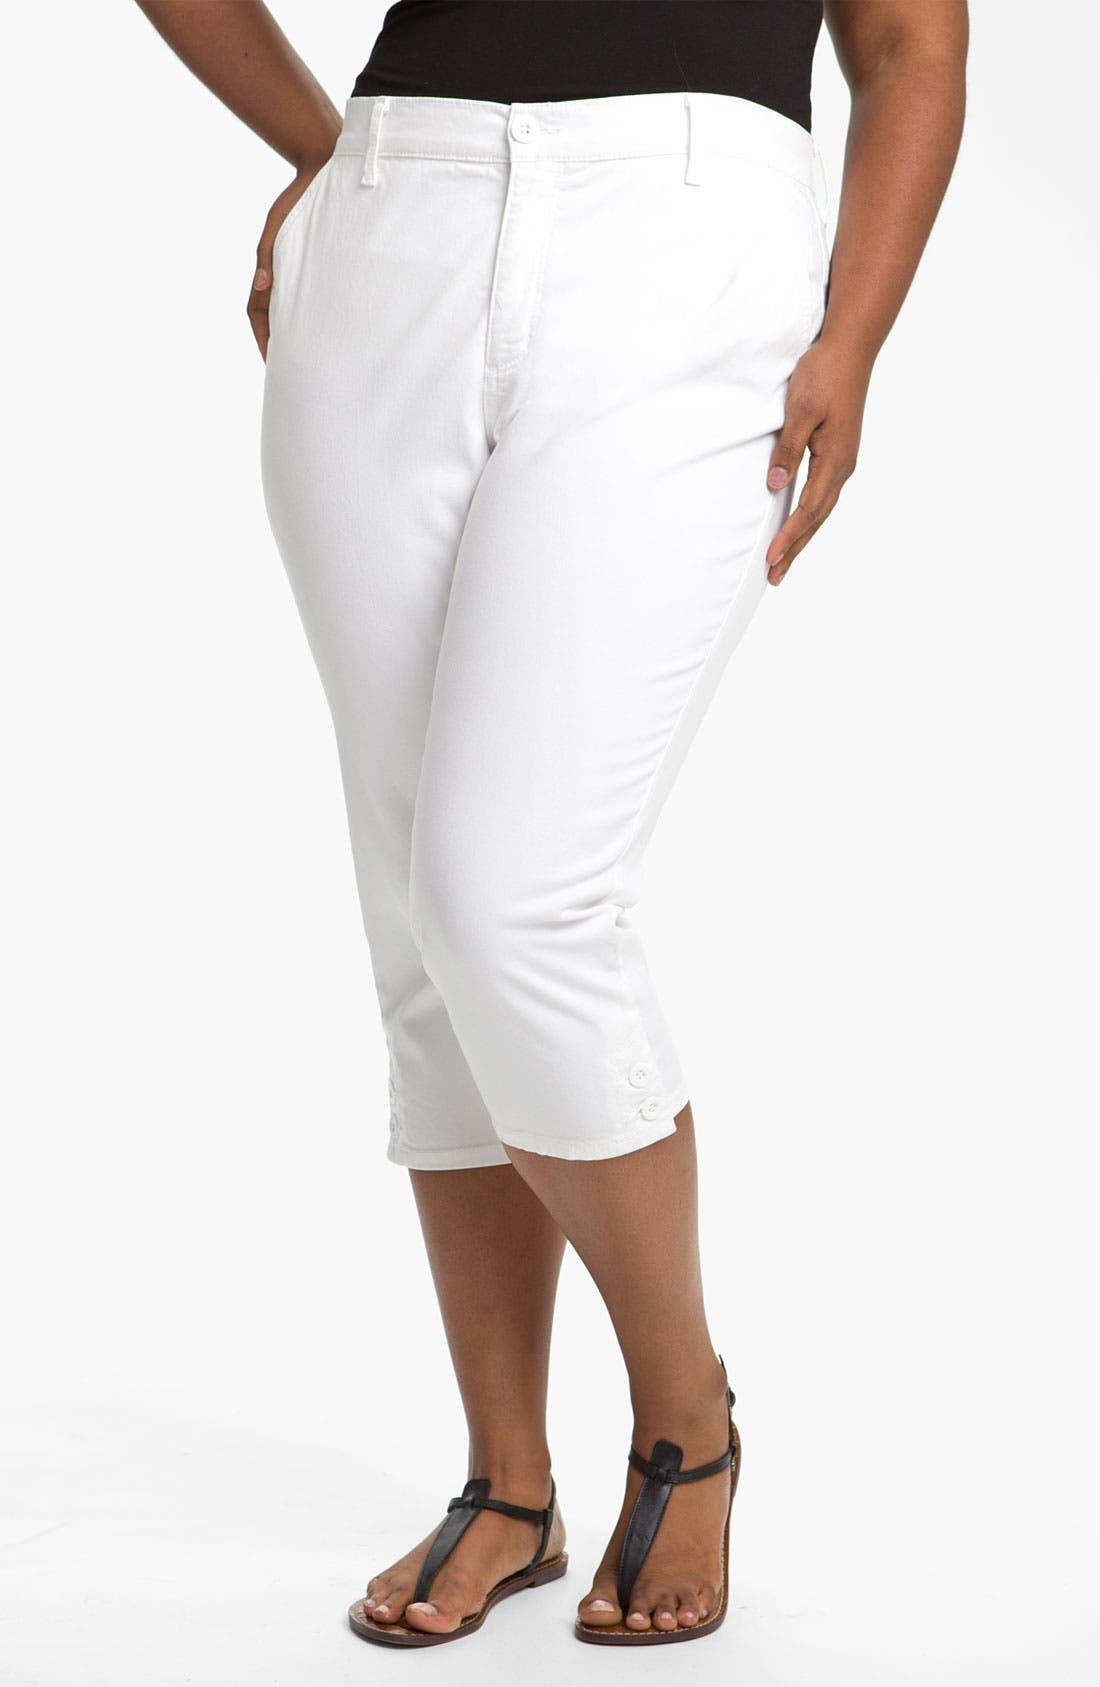 Alternate Image 1 Selected - NYDJ 'Sammie' Crop Stretch Jeans (Plus Size)